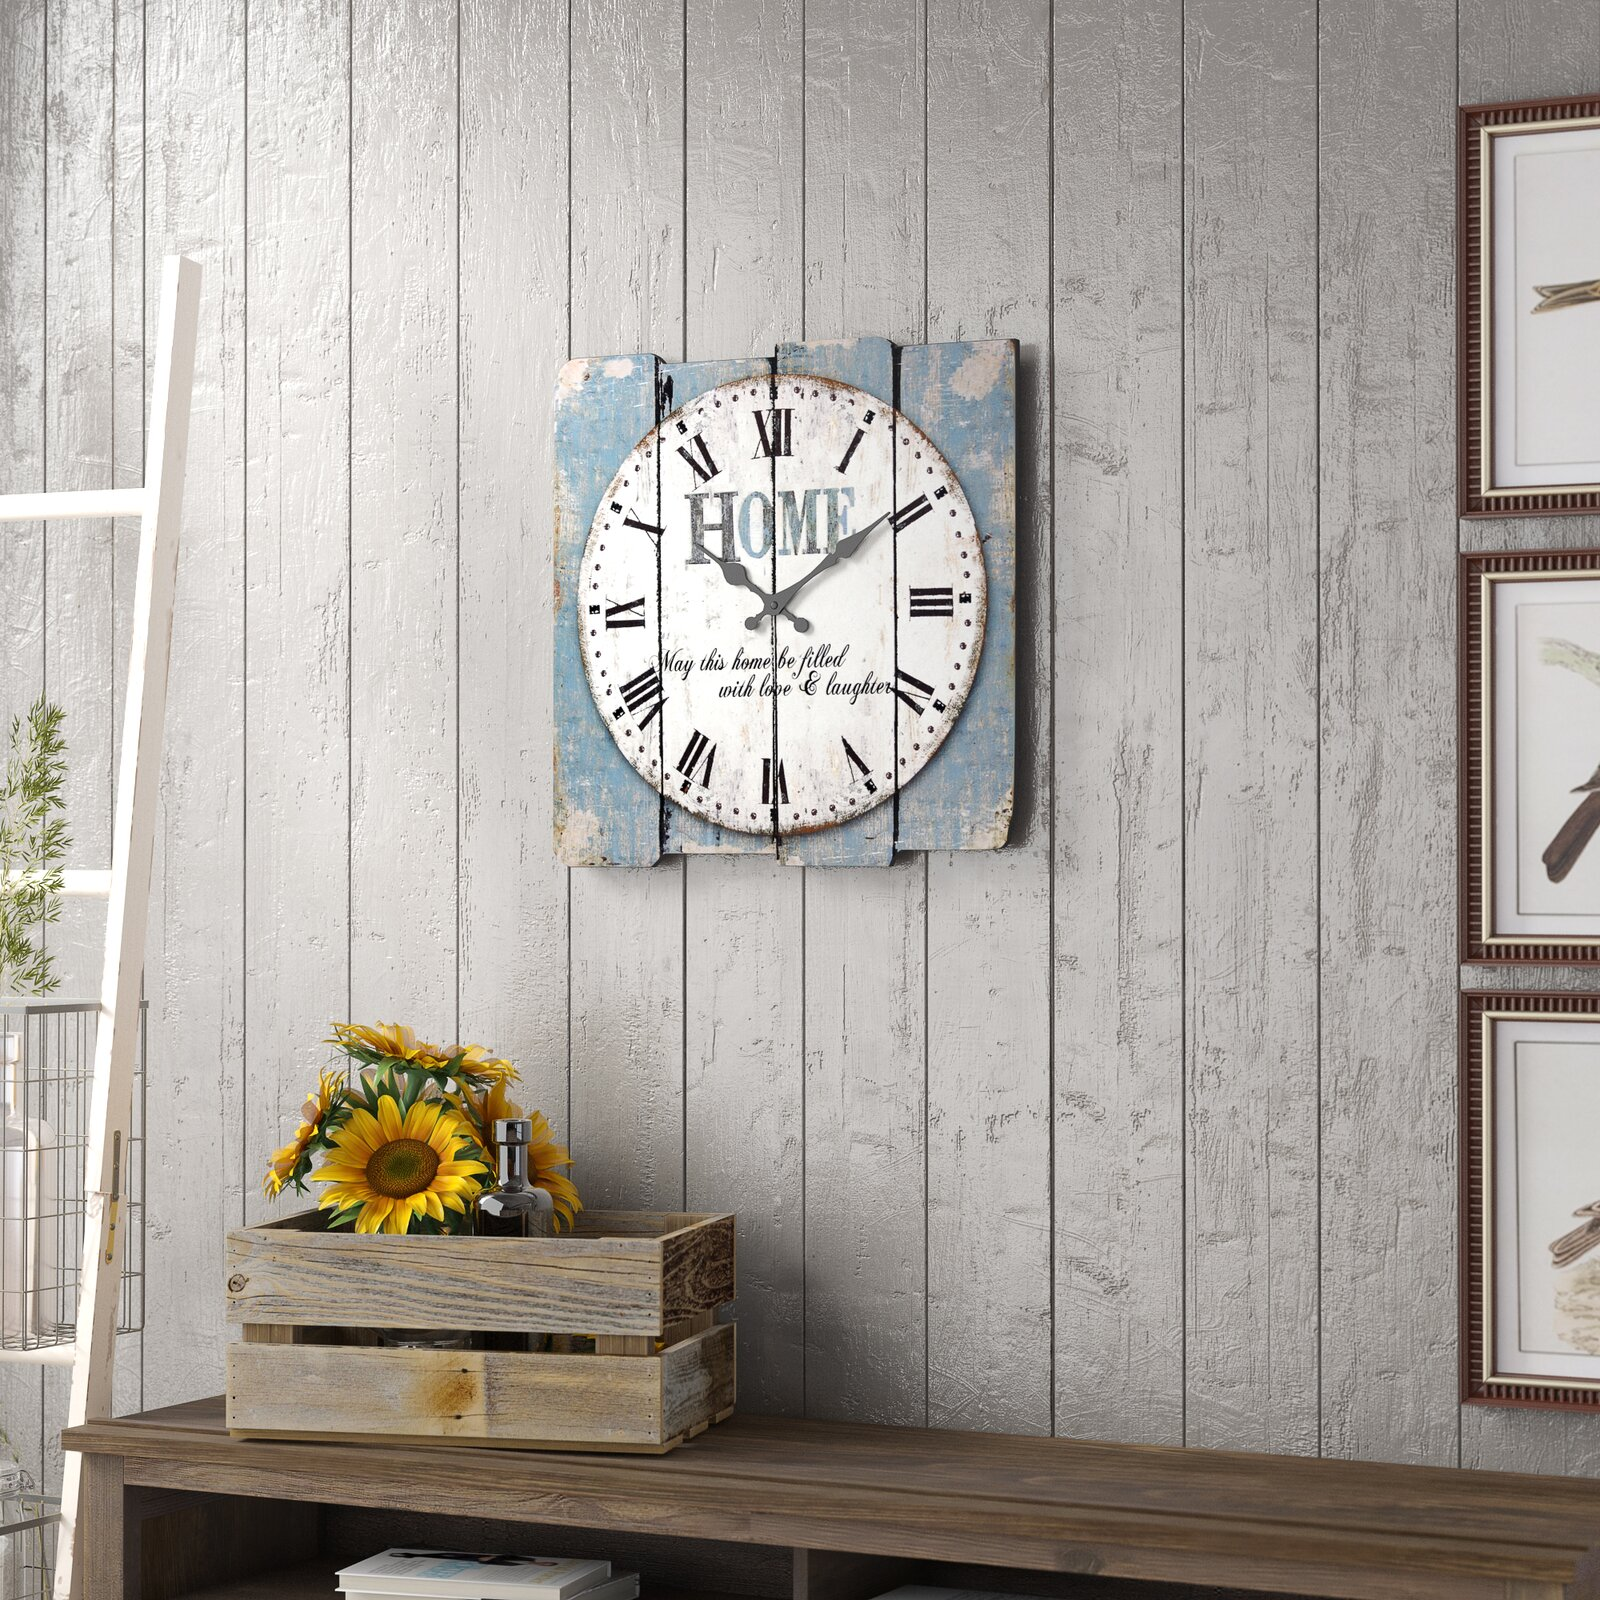 Vintage Shabby Chic Wall Clock - Pettine Wall Clock